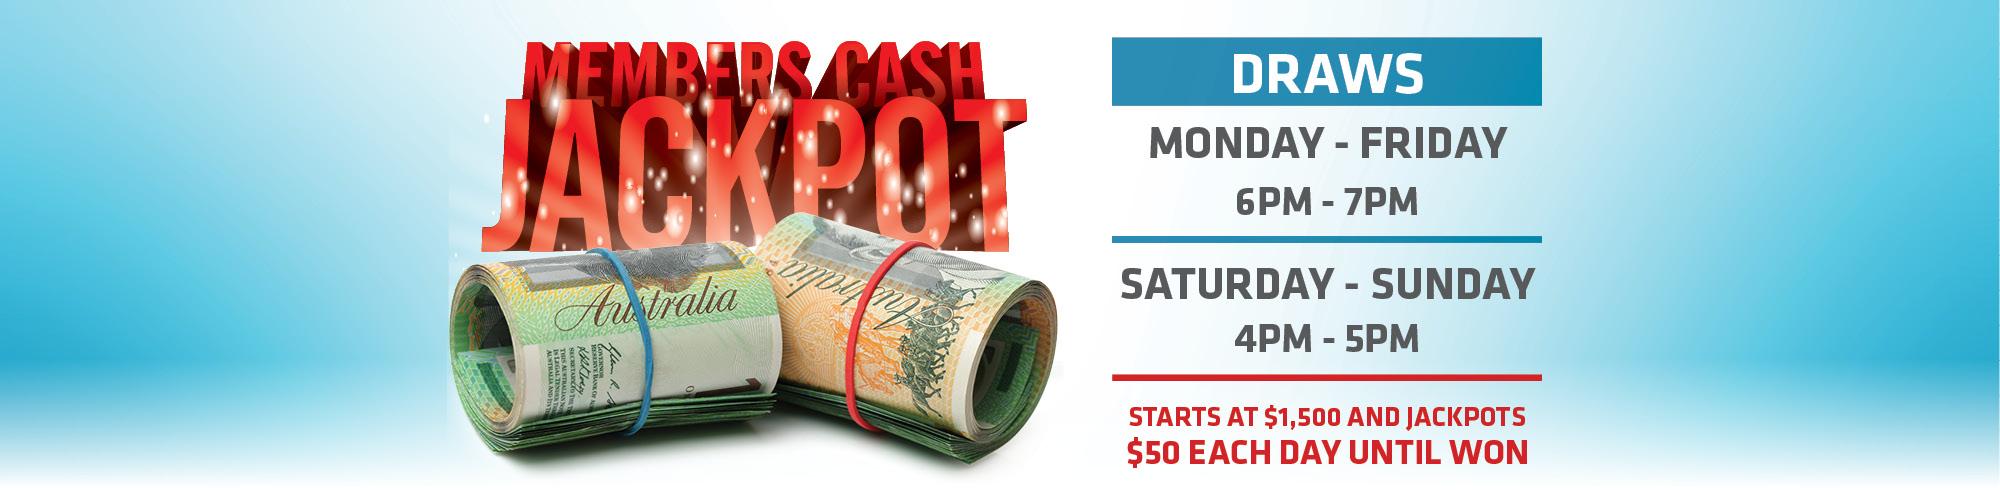 Members-cash-jackpot-website-slide-2000x500